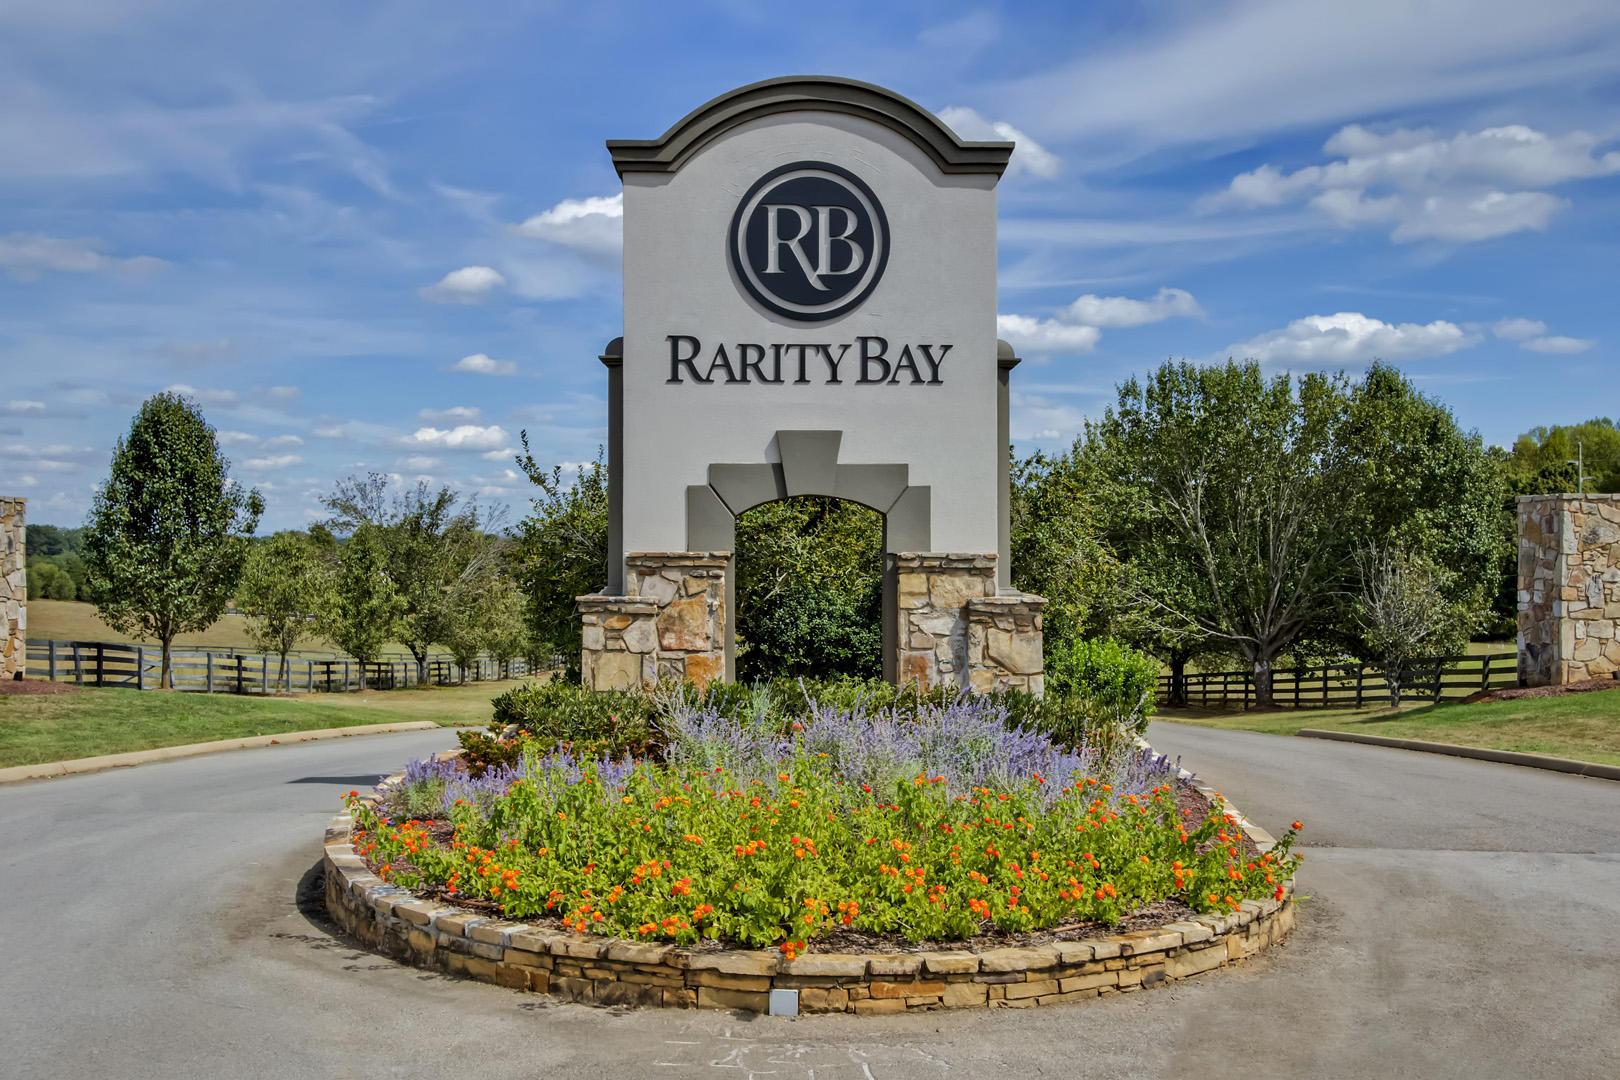 1671 Rarity Bay Pkwy: